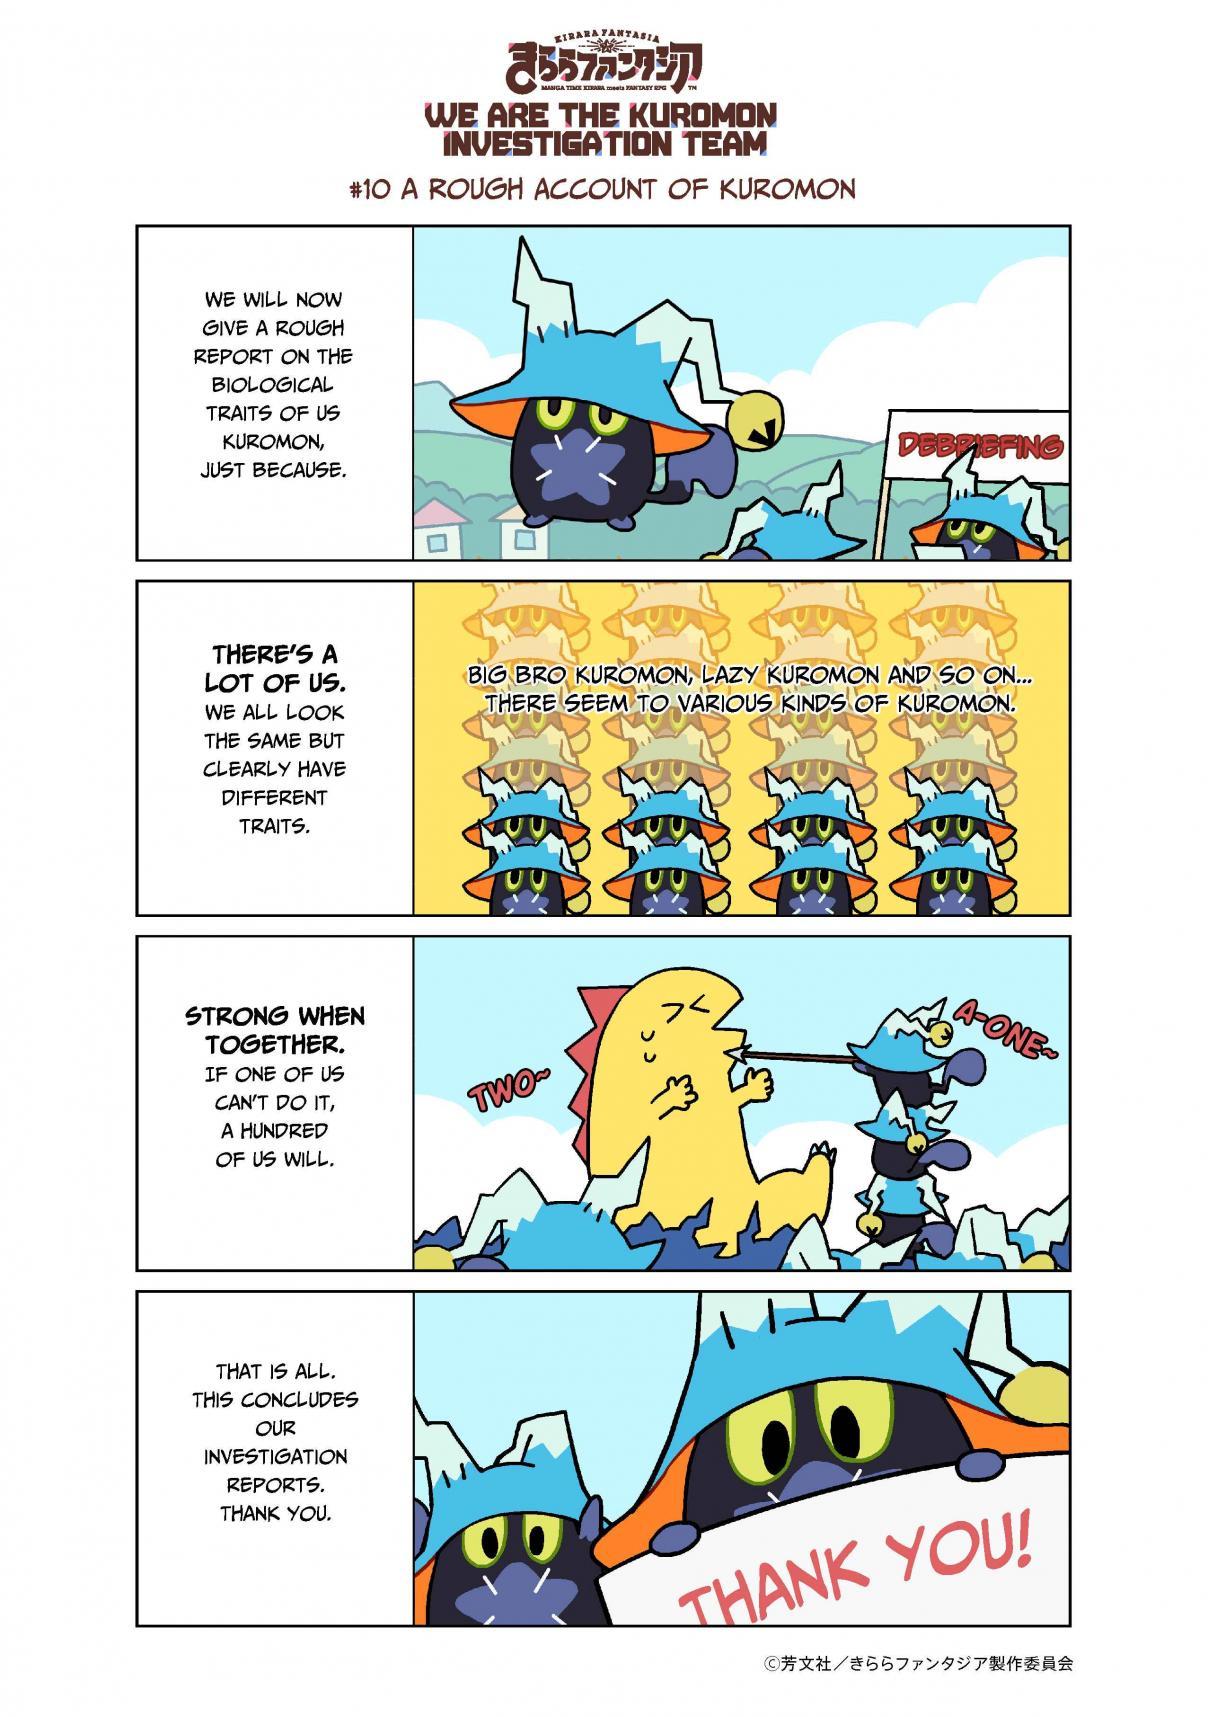 https://img2.nineanime.com/comics/pic2/11/32779/937843/d67b6b1e0556f3d2156cca2a857765ae.jpg Page 1